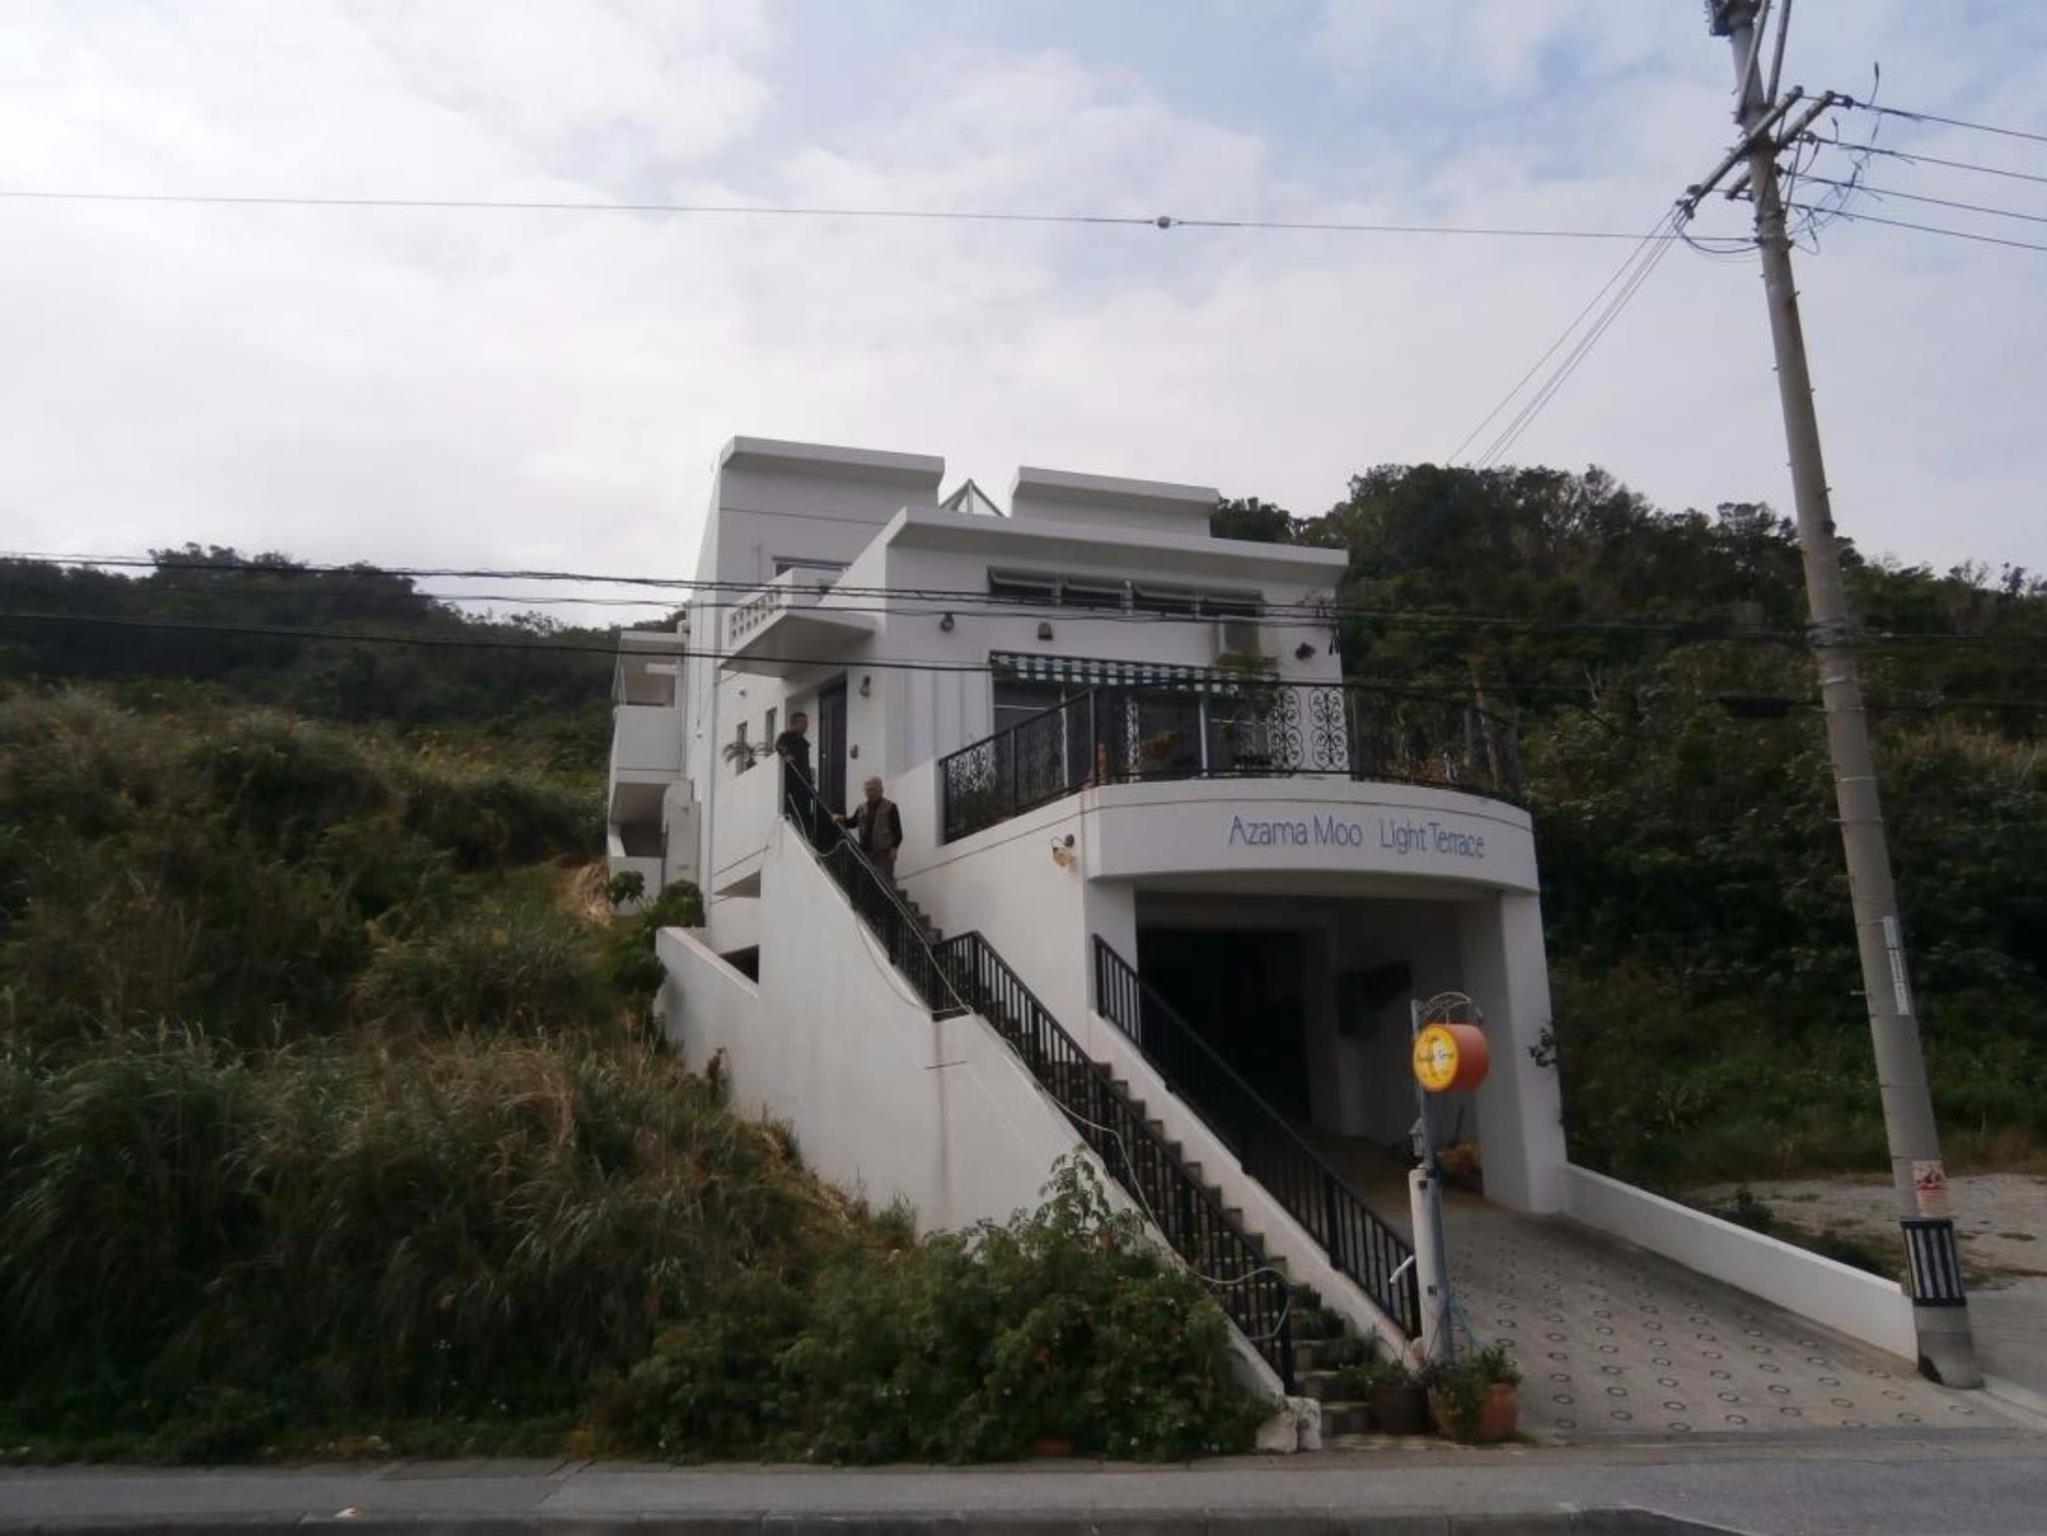 Auberge Azama Moon Light Terrace, Nanjō